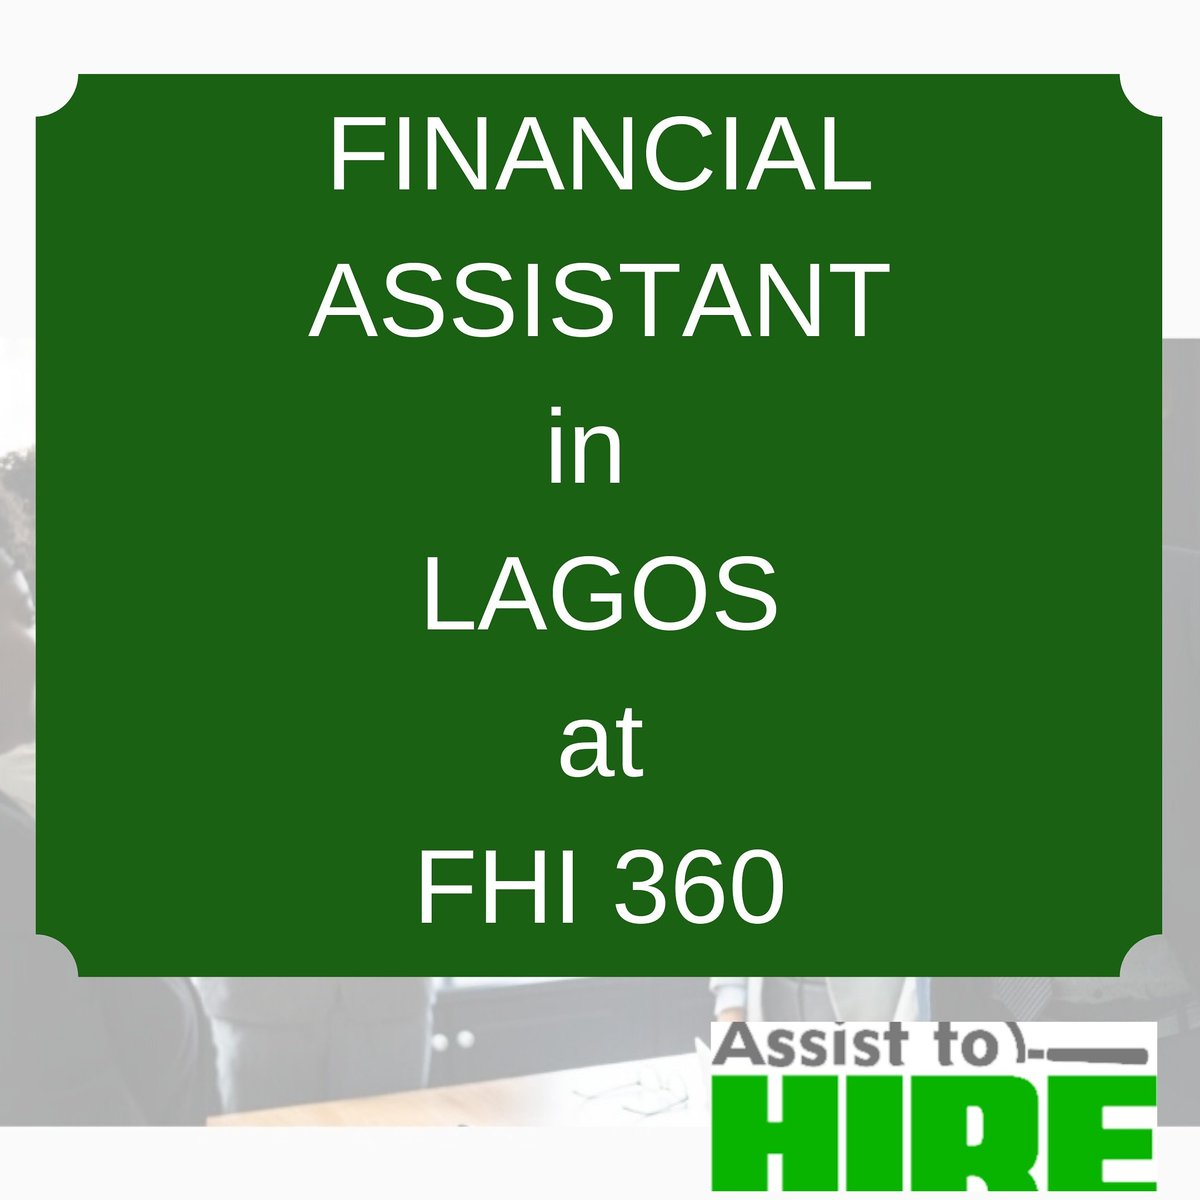 Fhi360nigeria Hashtag On Twitter